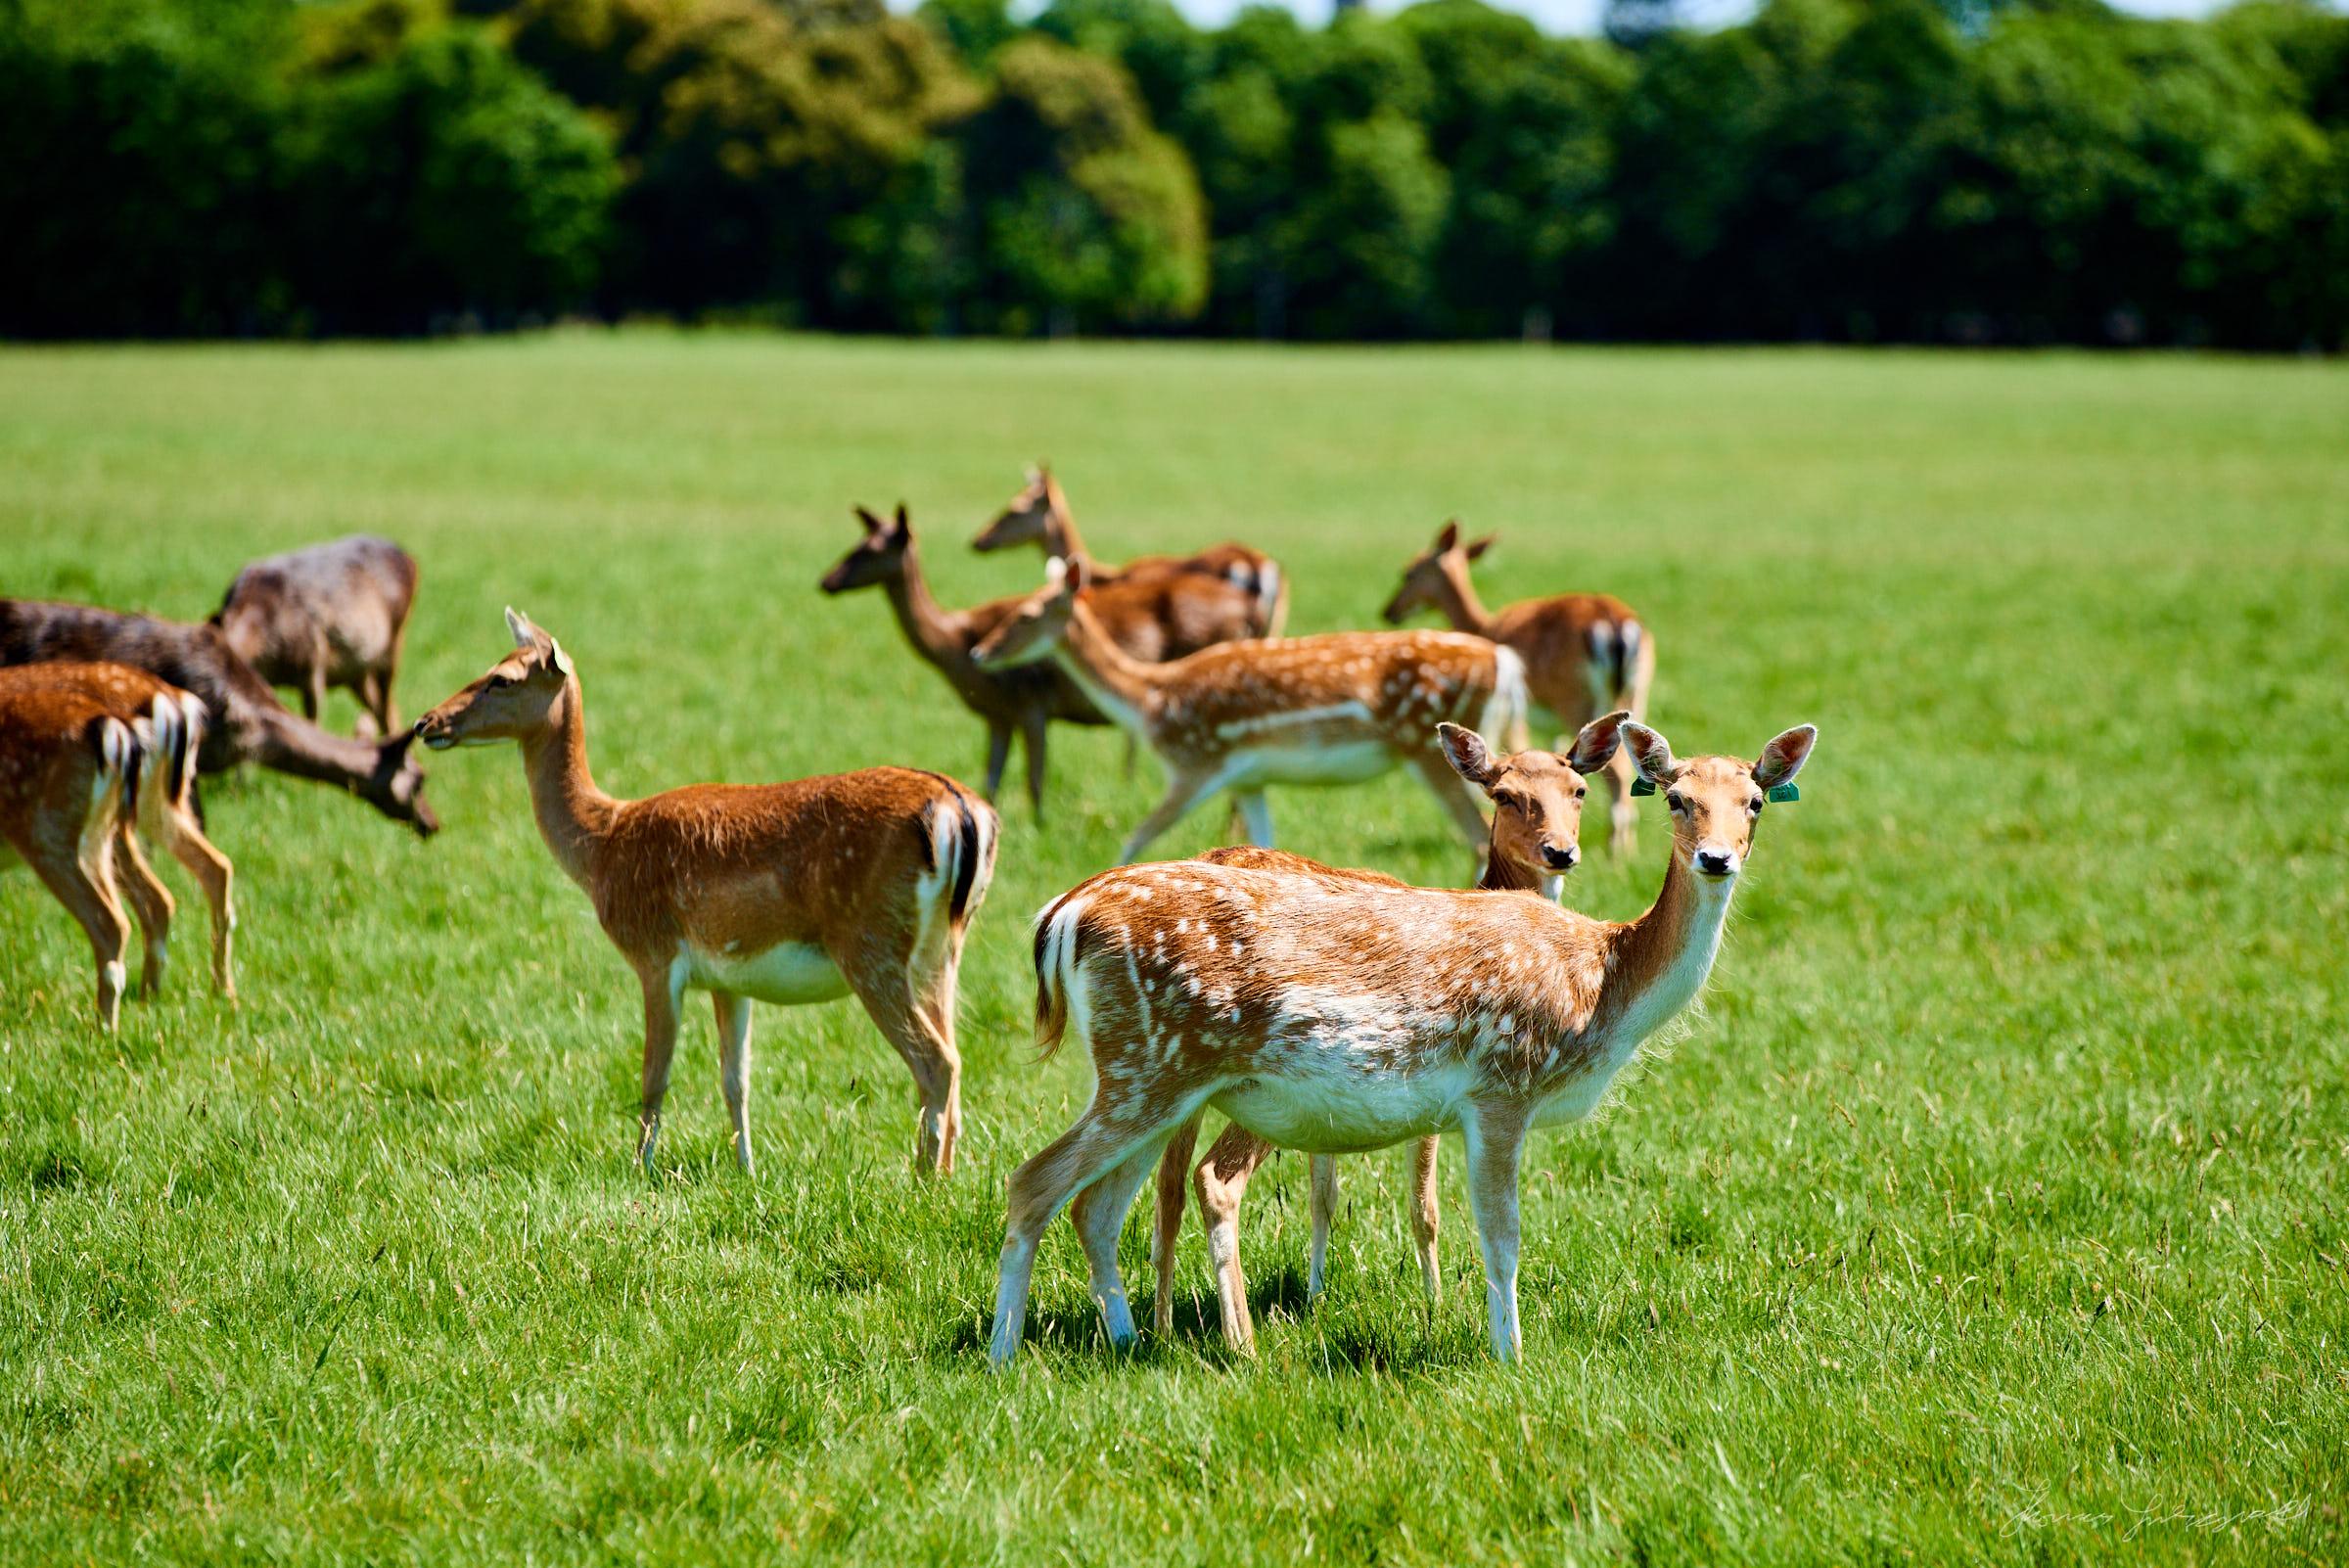 Deer in Pheonix Park in the centre of Dublin